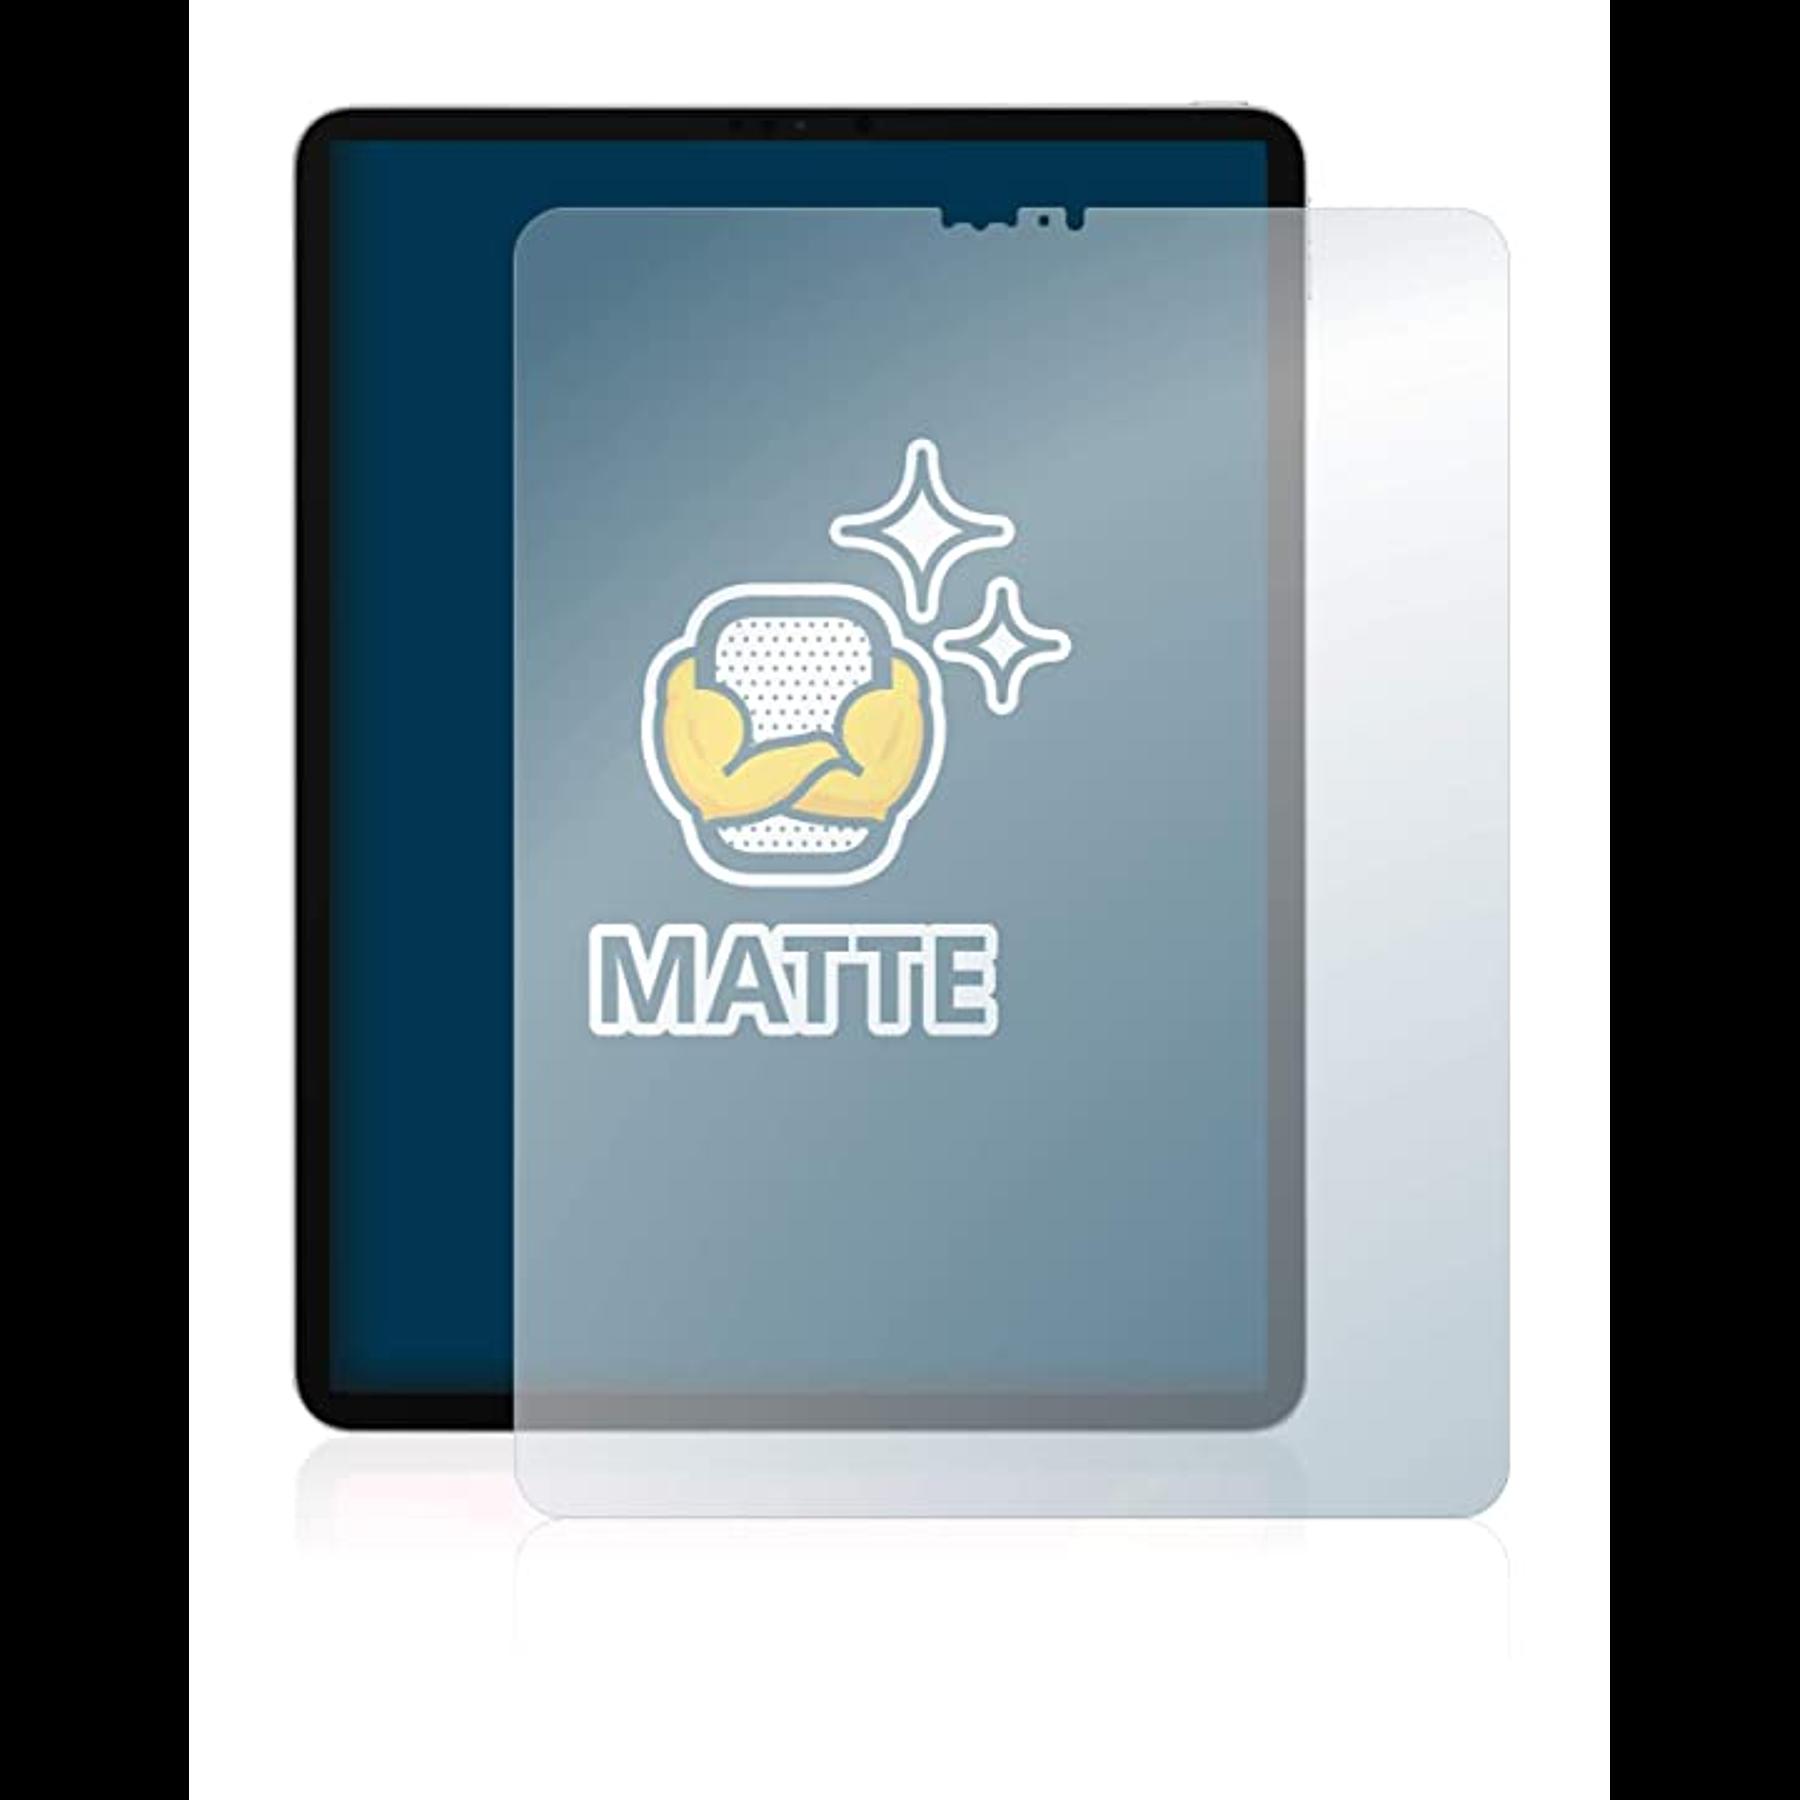 Lámina de Hidrogel para Tablet de todas marcas - Matte Anti Huellas